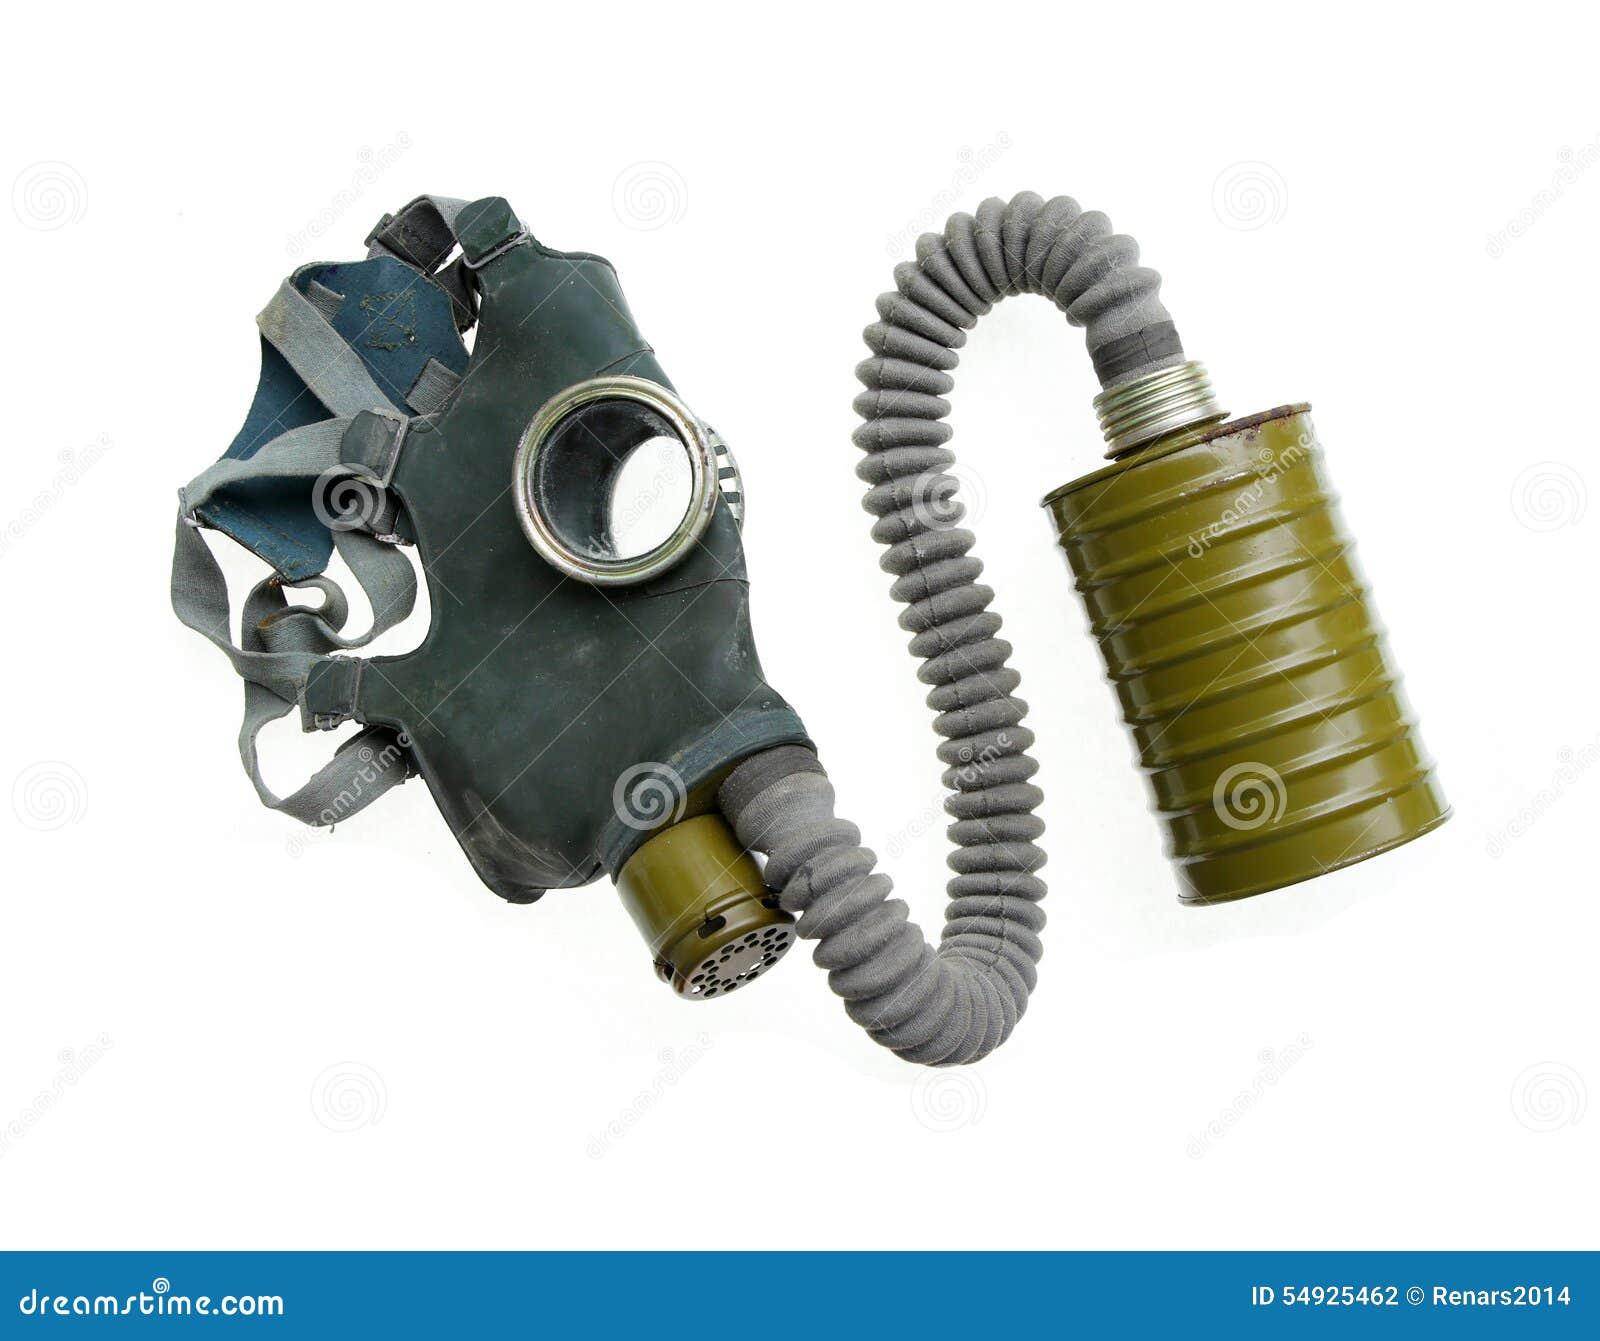 masque a oxygene respiratoire